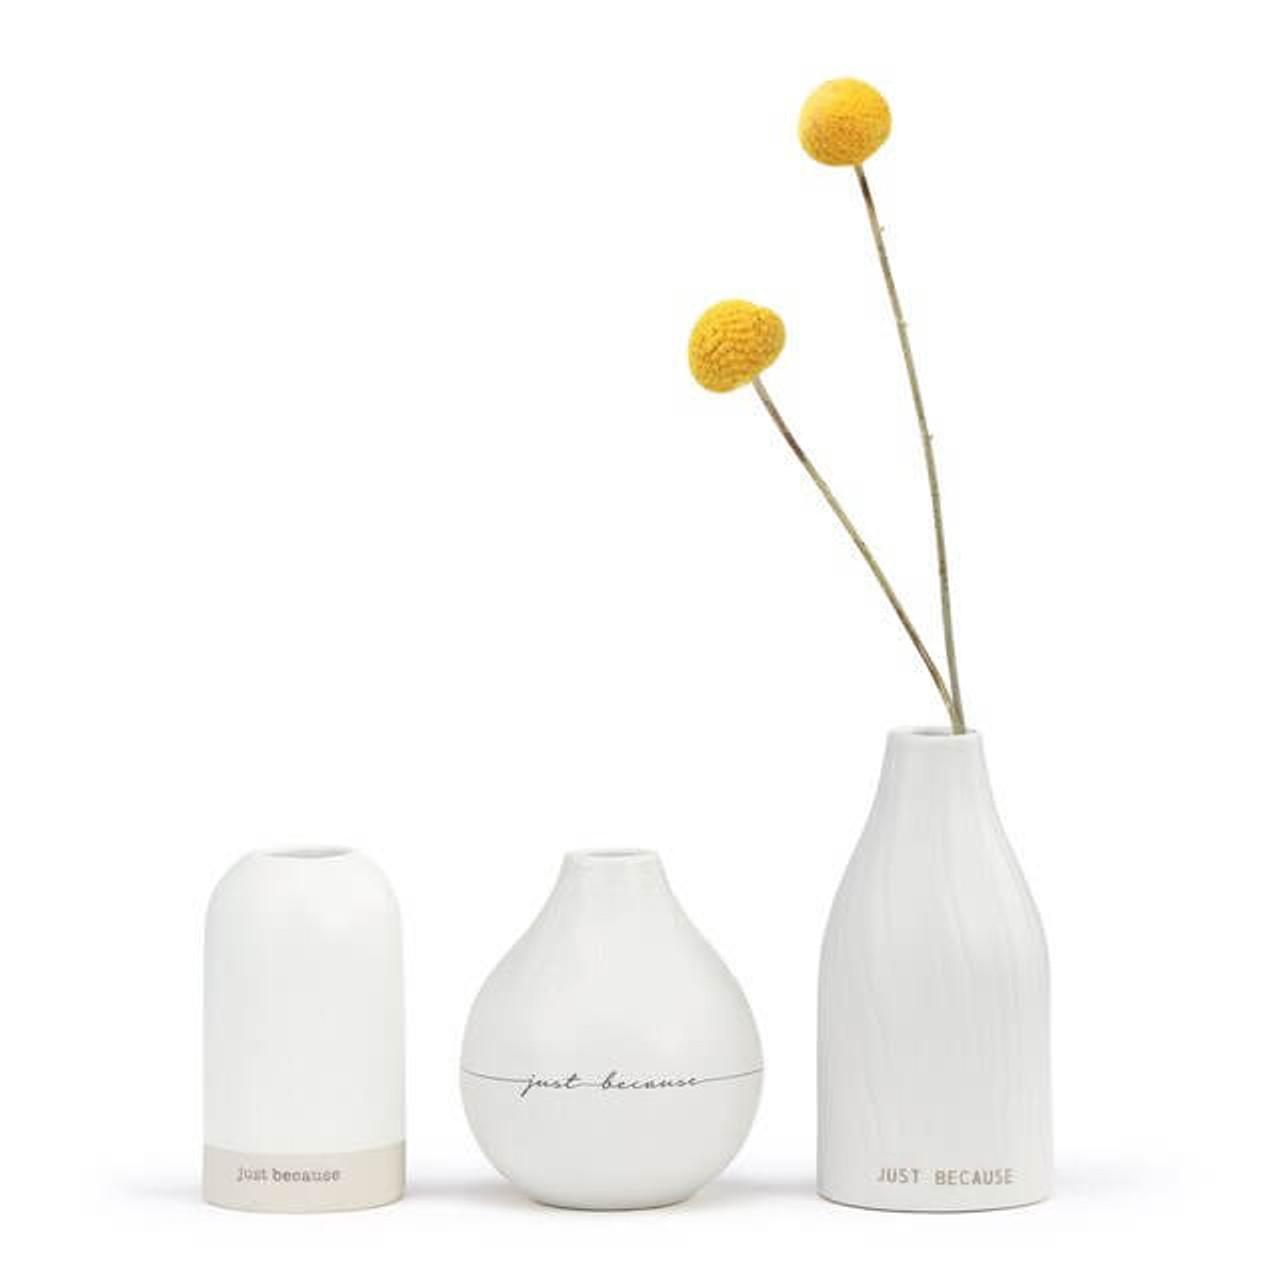 XOXO Just Because Vase Demdaco